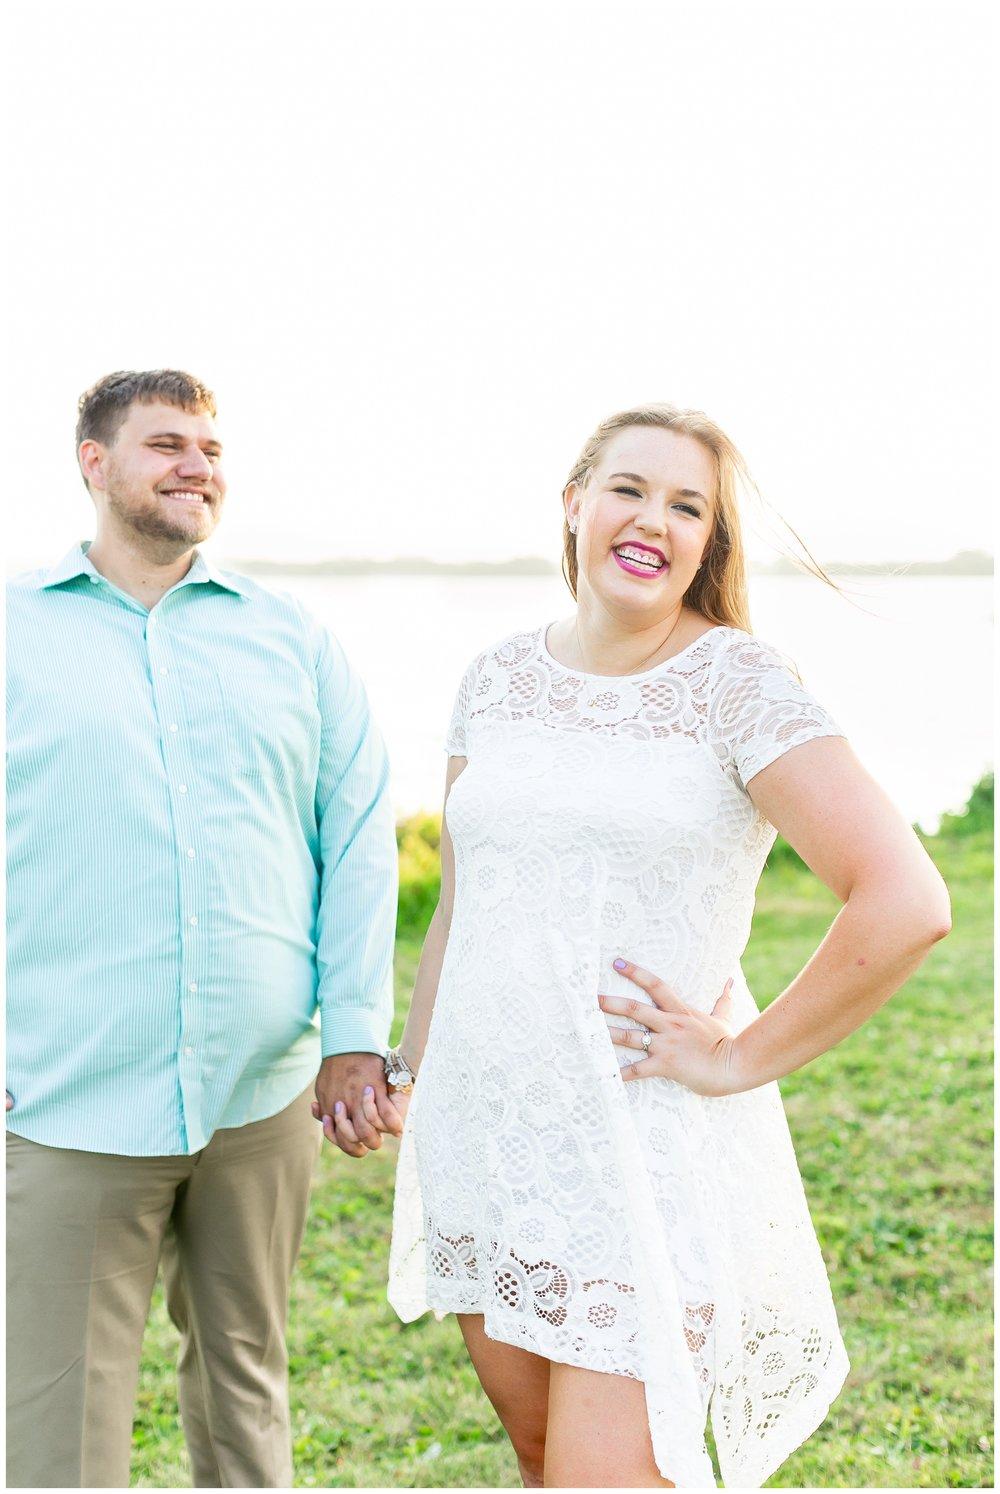 olbrich_biergarten_madison_wisconsin_wedding_Photographers_0474.jpg